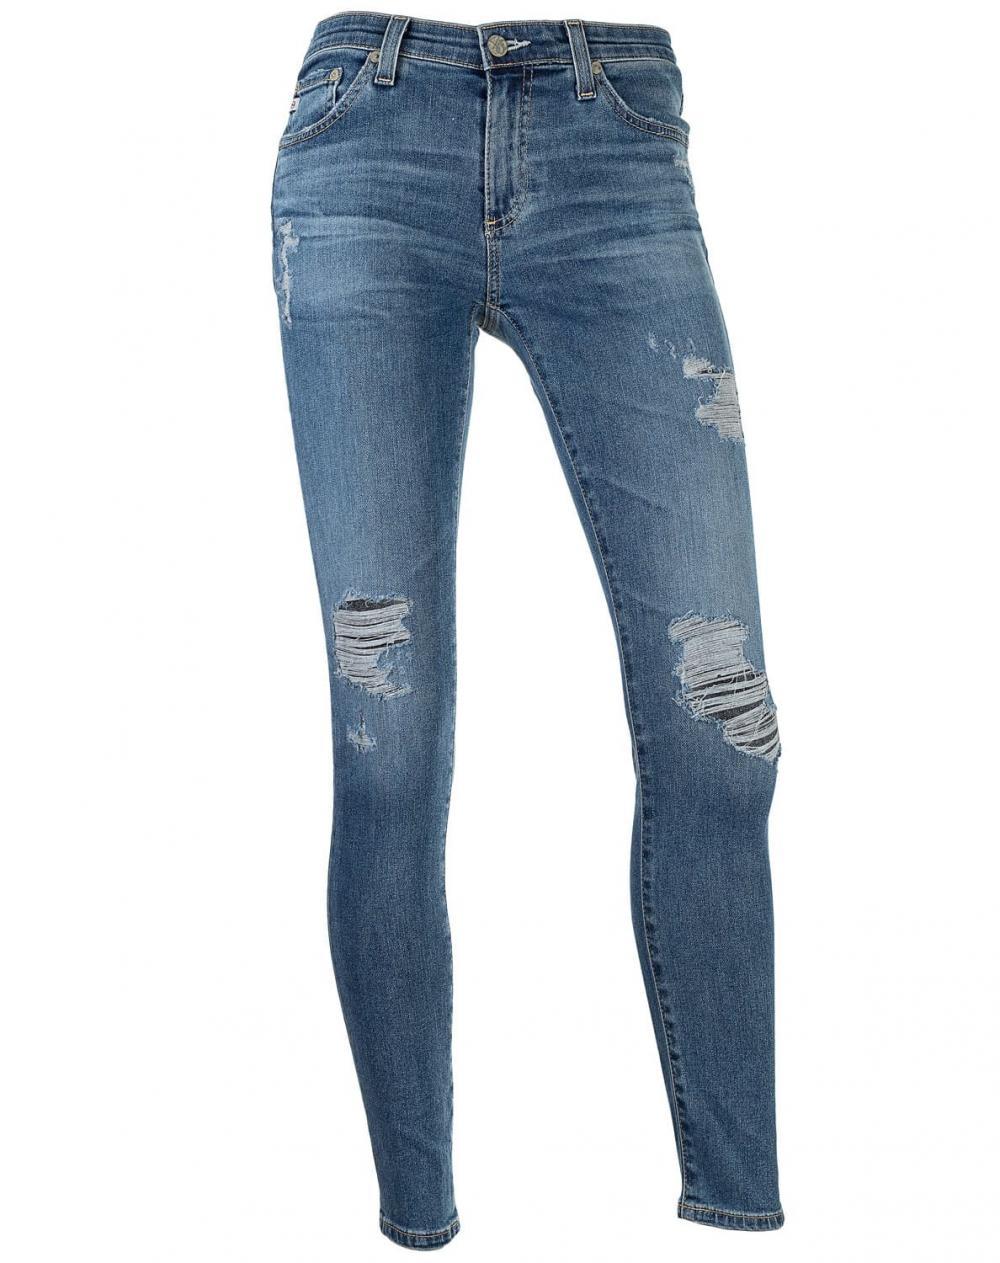 Jeans Legging Ankle 13Y